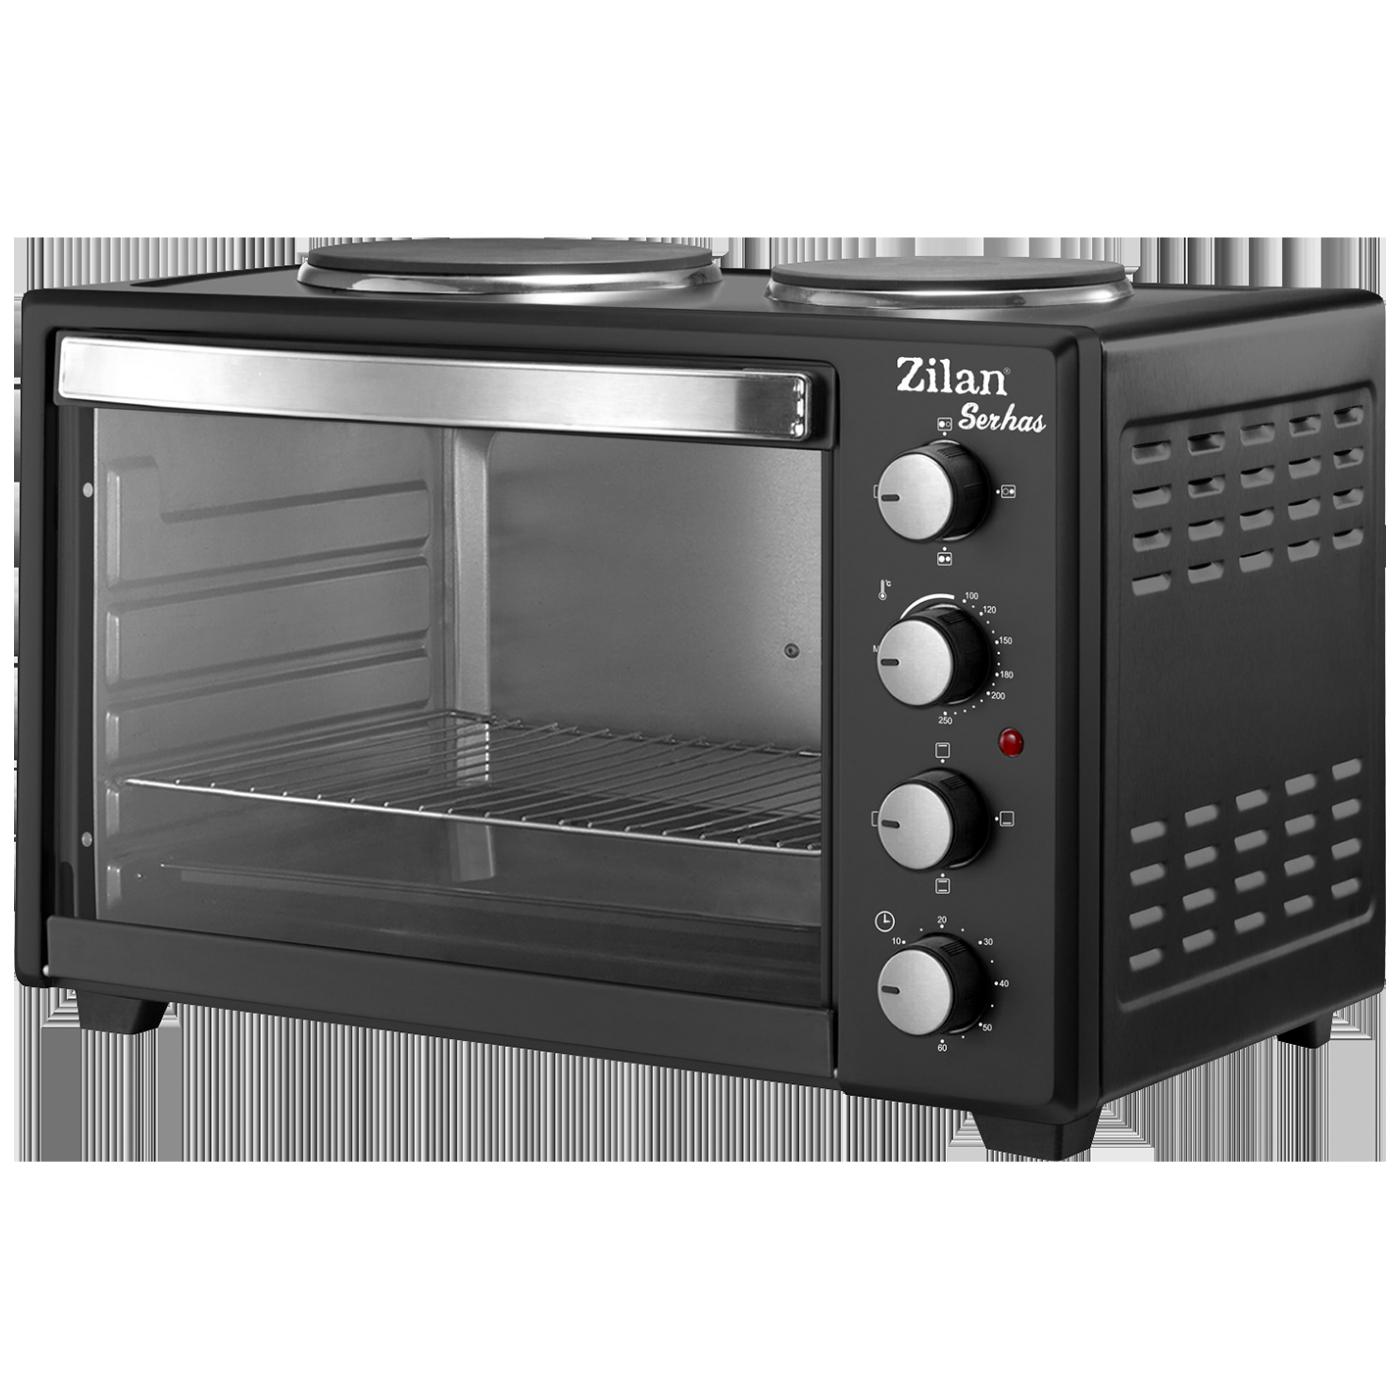 Zilan - ZLN2935